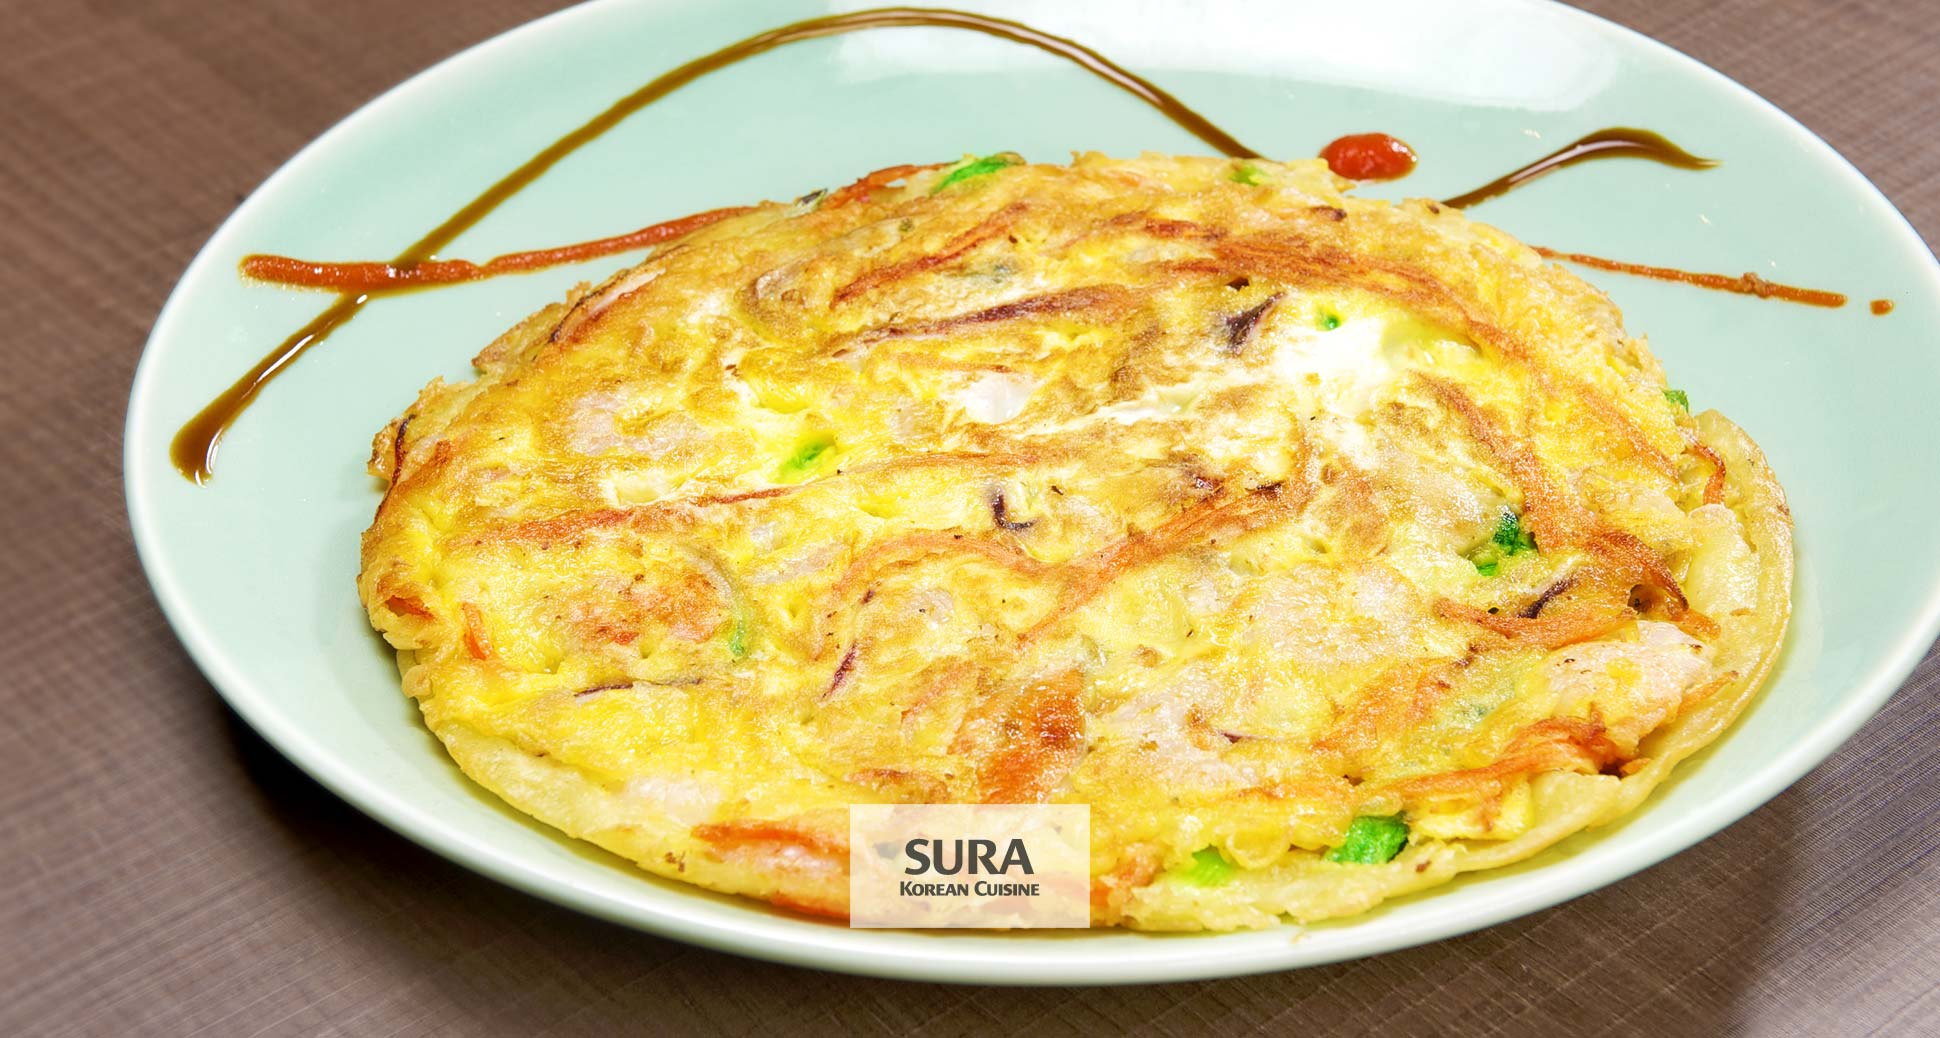 Why do koreans love to enjoy korean style pancakes and drink korean rice wine on a rainy day?